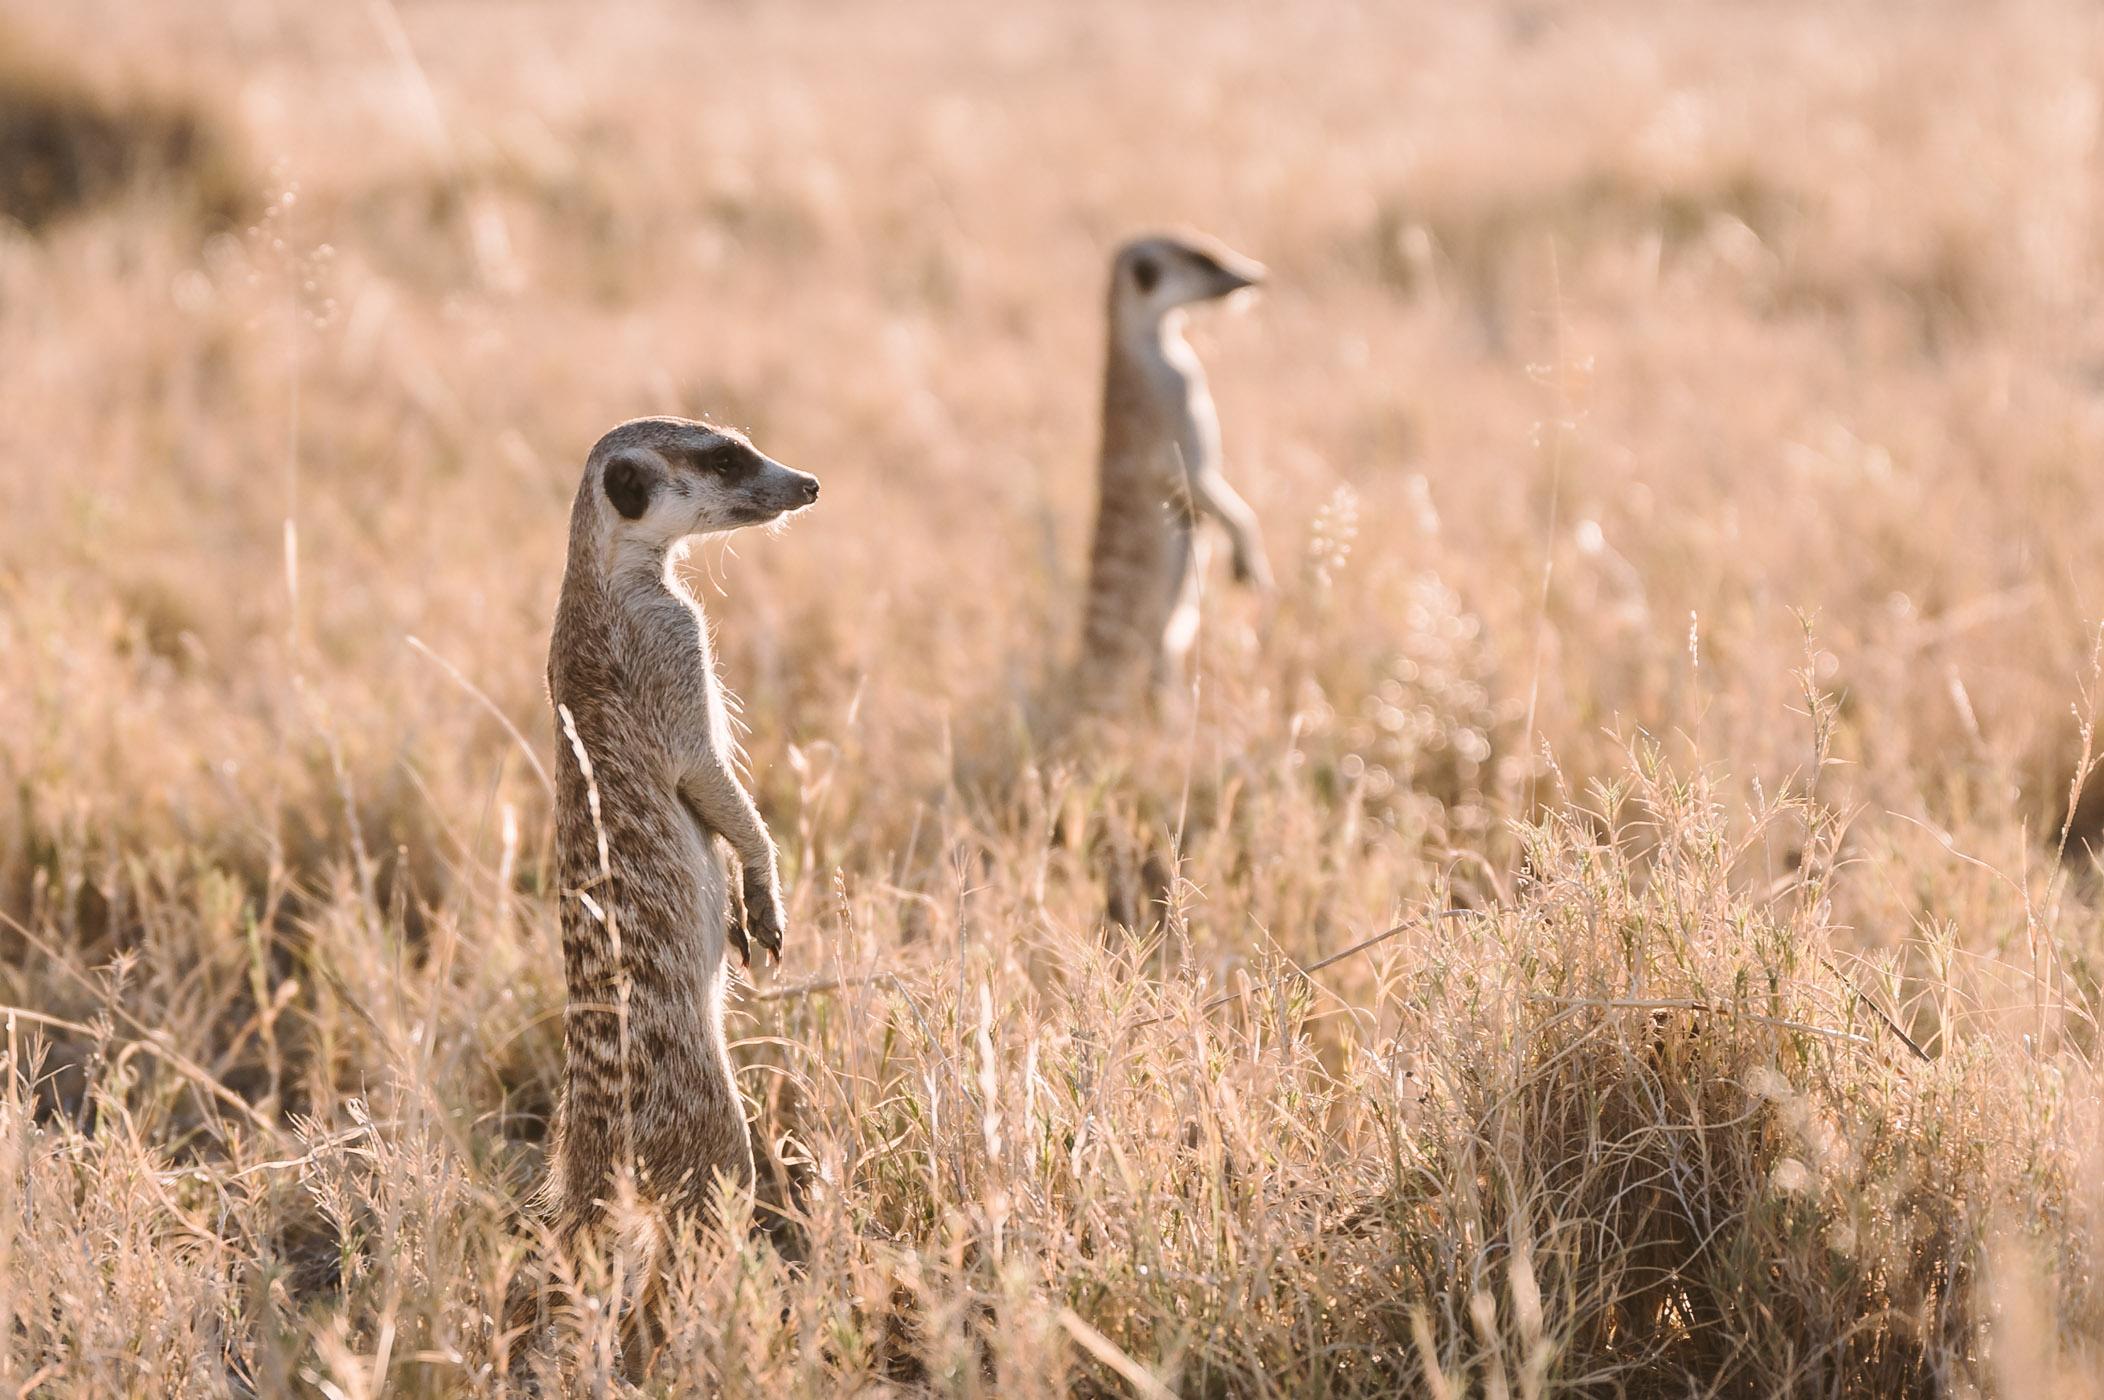 Meerkats in the Makgadikgadi in Botswana